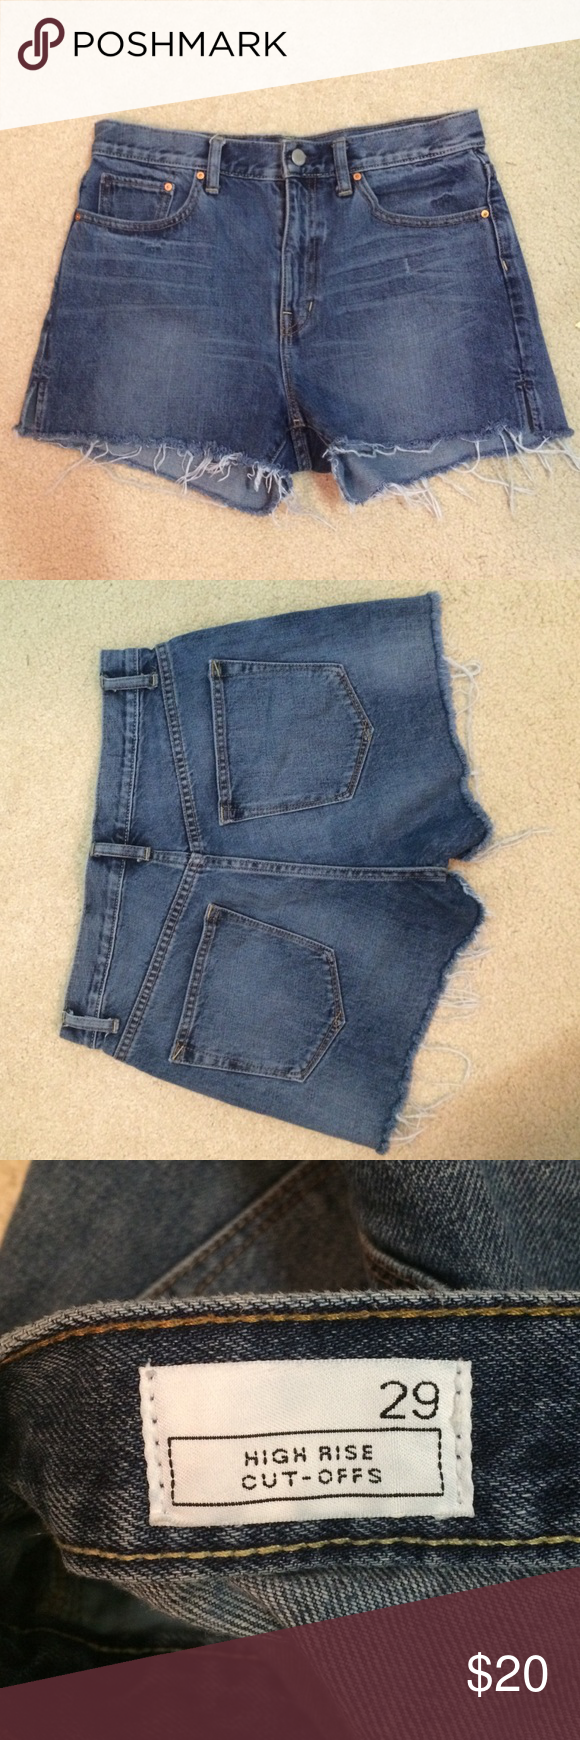 High Rise Jean Cut Offs Gap high rise Jean cut offs! Comfortable and flattering. Not too short. GAP 1969 Collection GAP Shorts